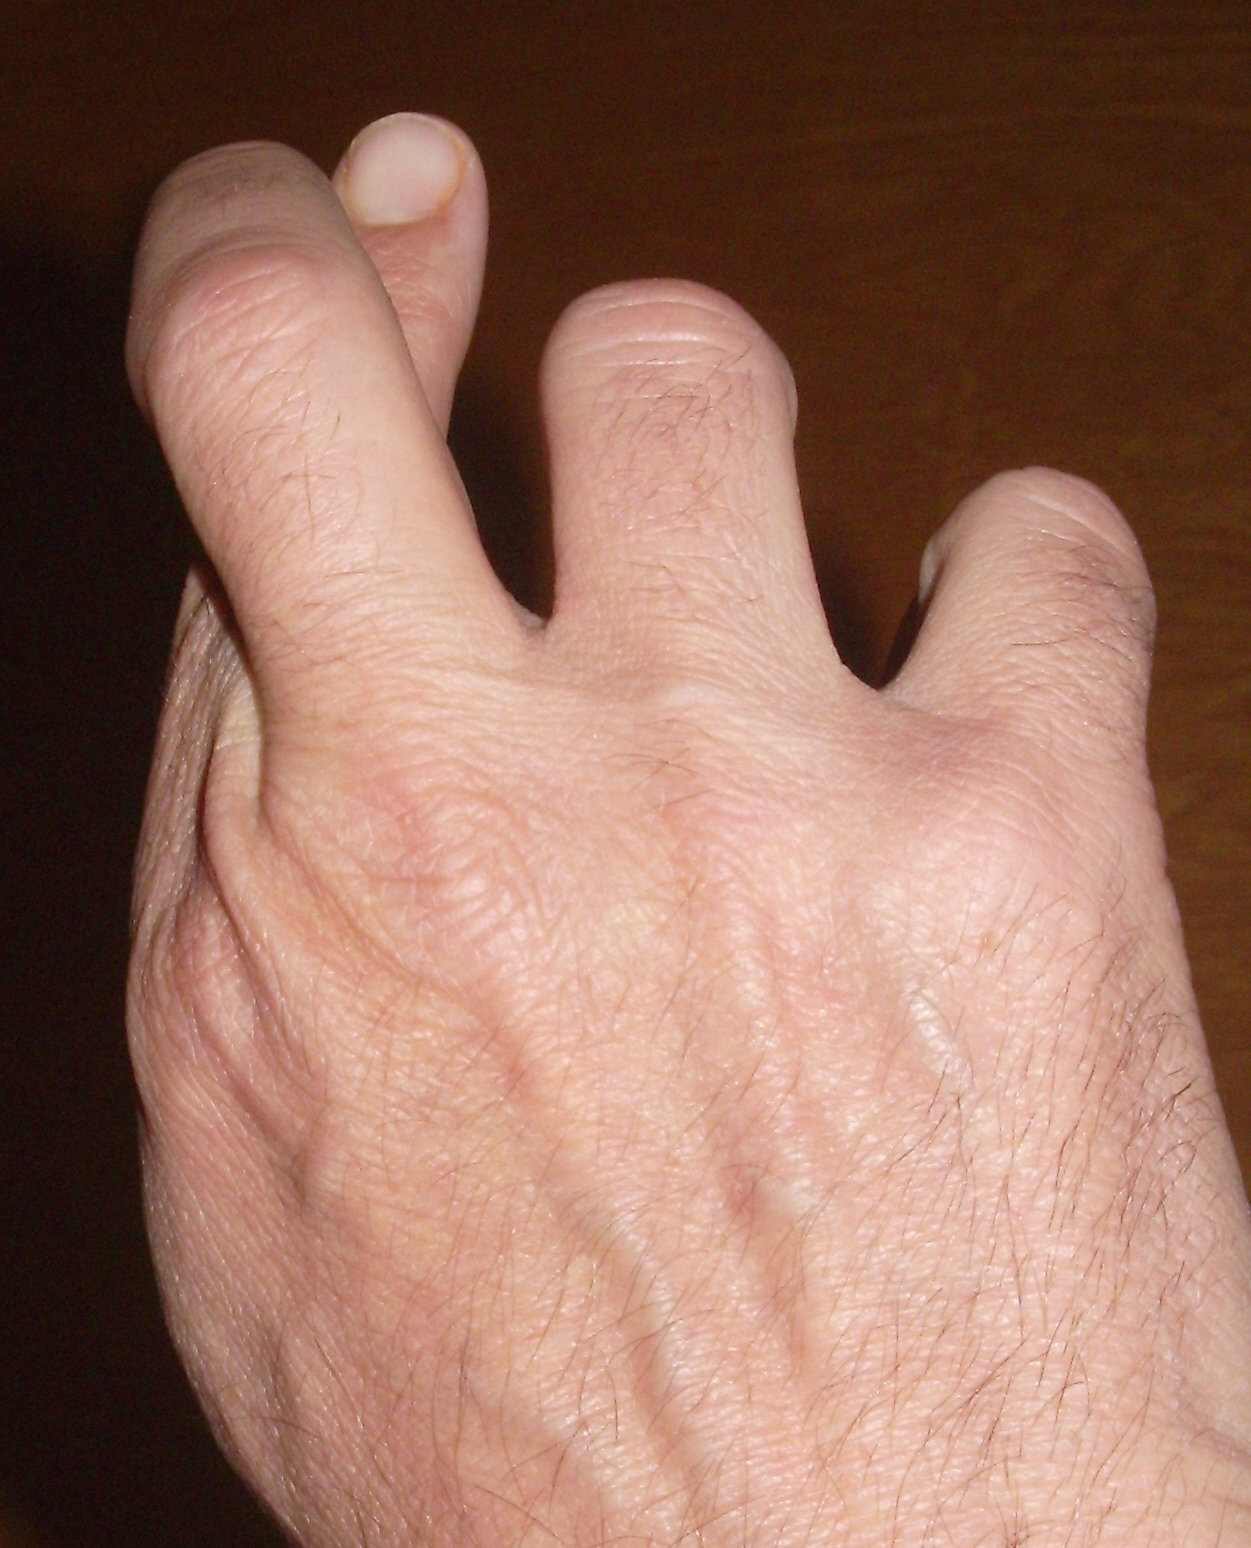 crossed fingers p1442-rot90.jpeg